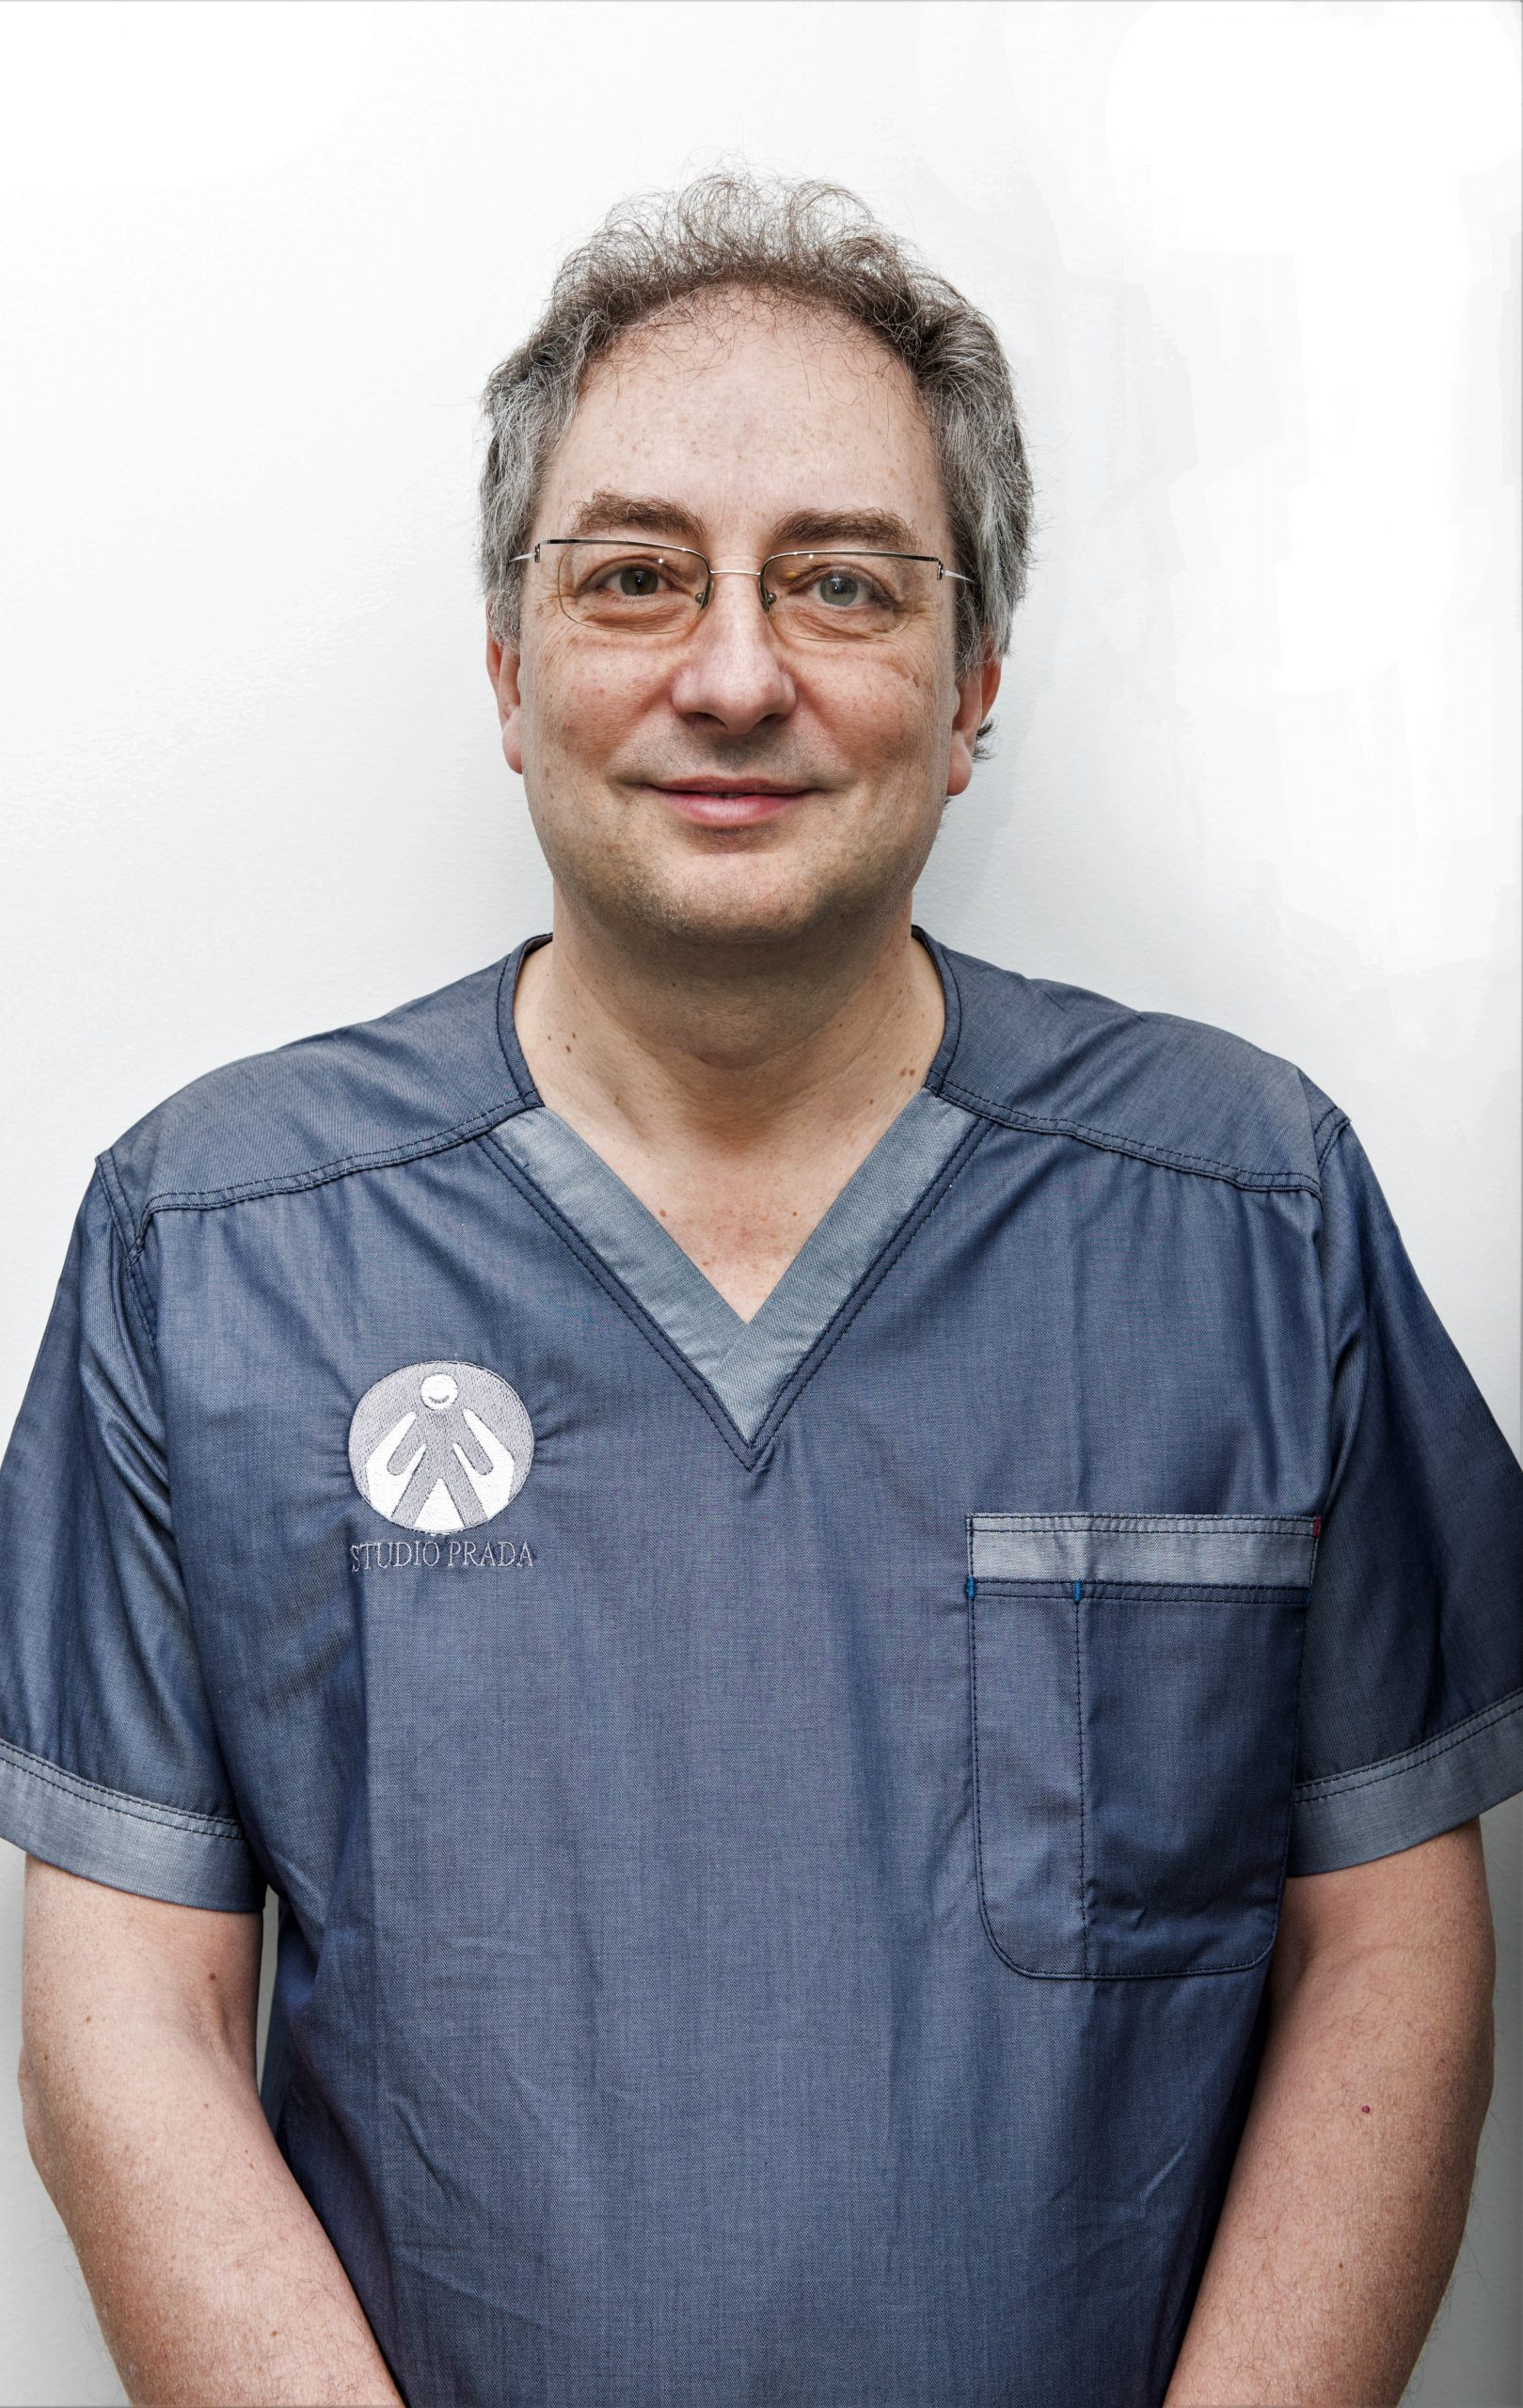 Dott. Gianfranco Prada